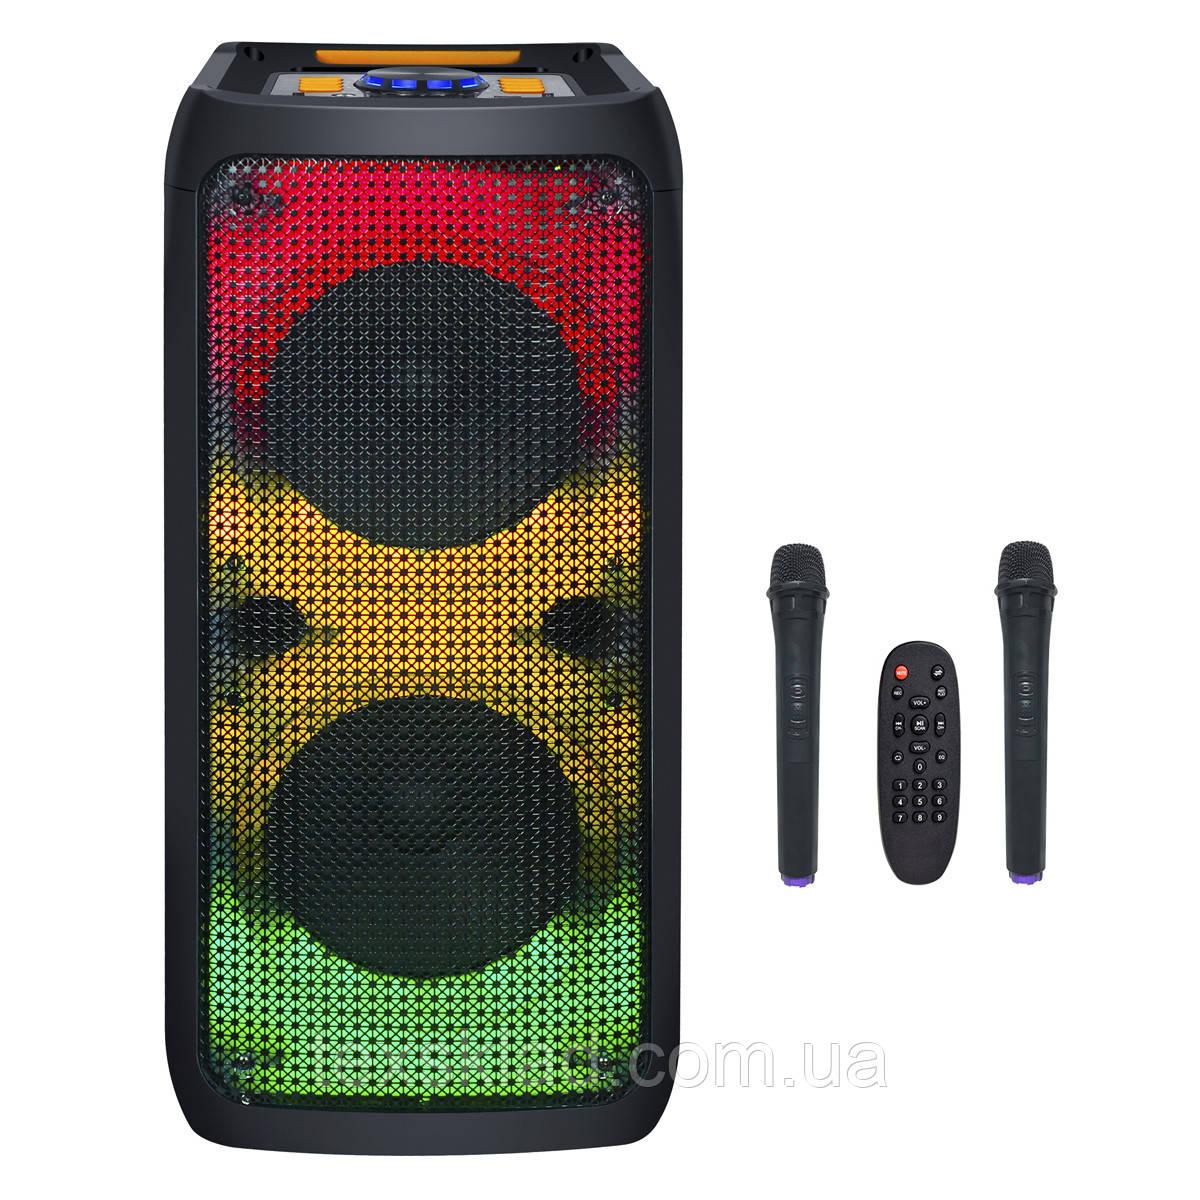 Портативная акустика JB800FLAME USB/MP3/BT/TWS/ 2 микрофона